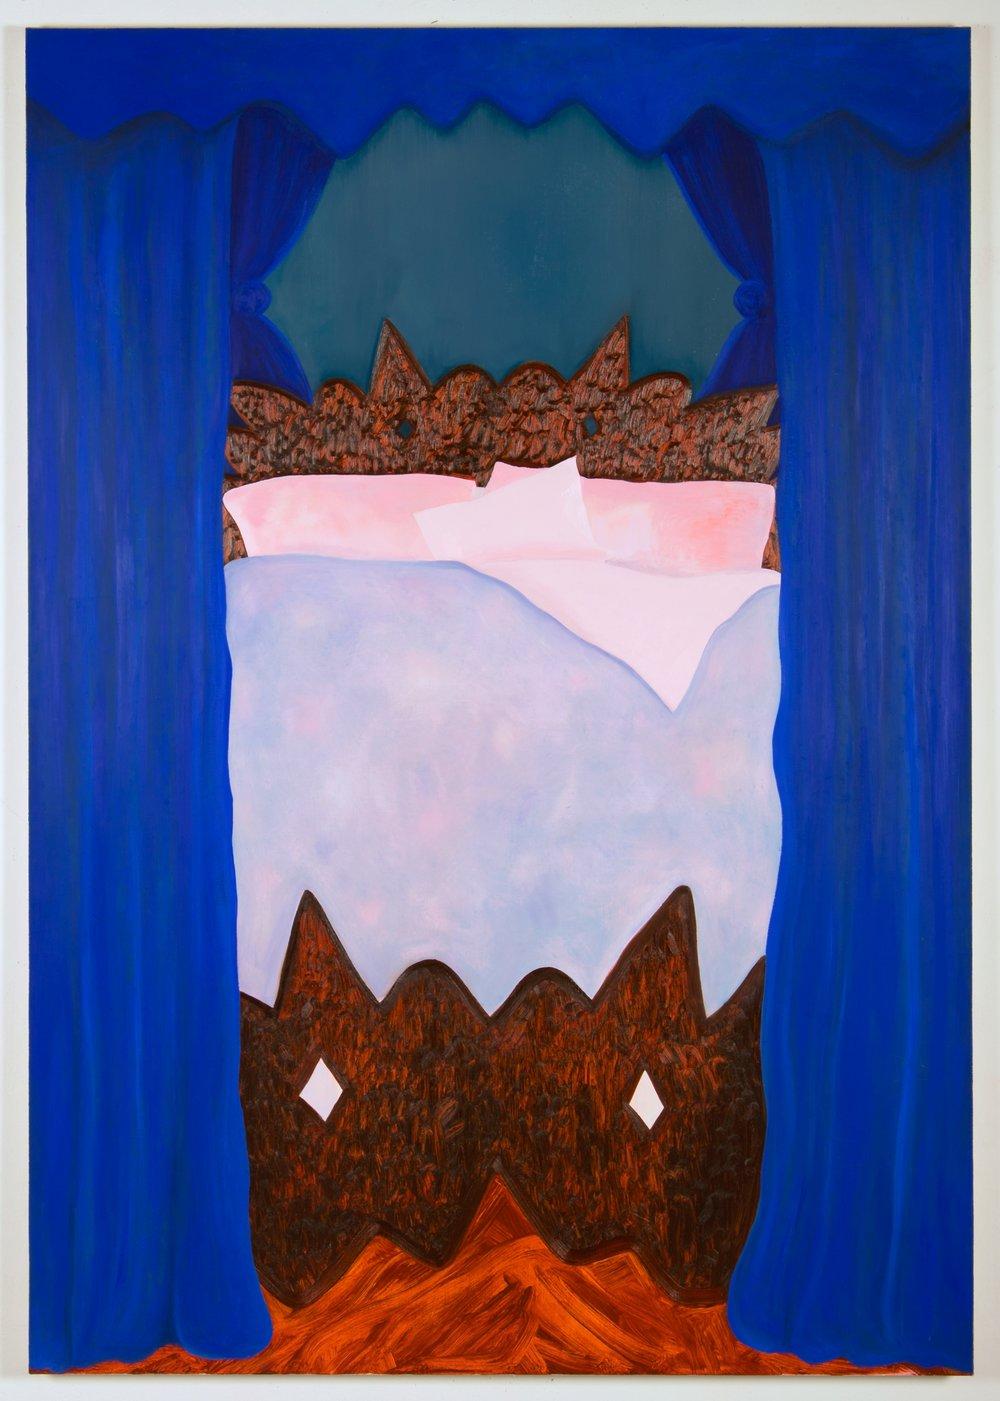 Princess S , oil on canvas, 200 x 140cm, 2018